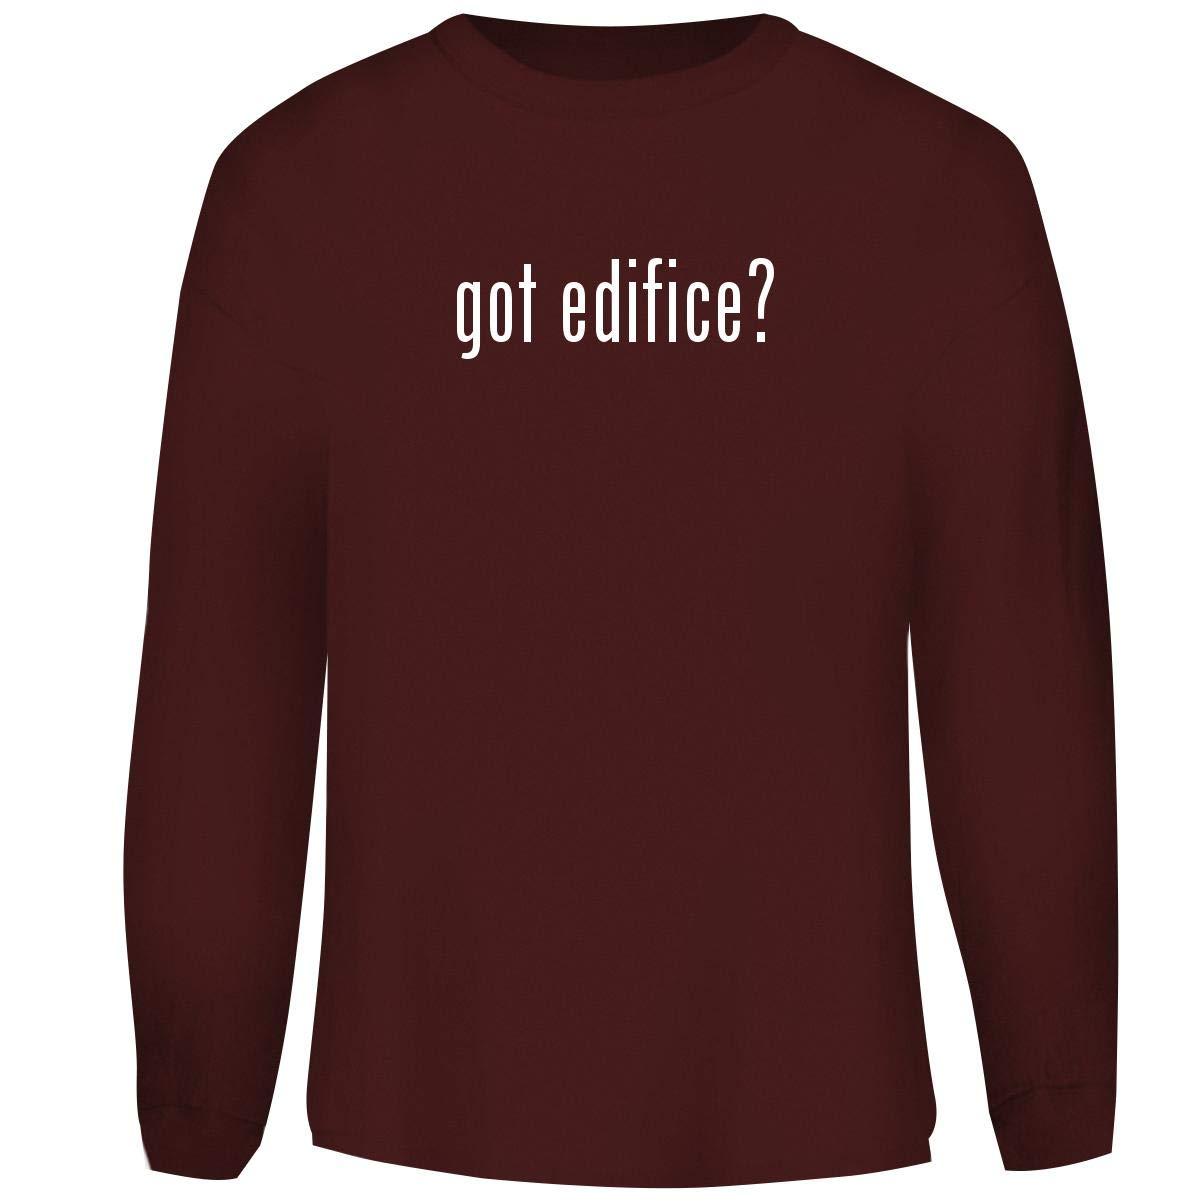 One Legging it Around got Edifice? - Men's Funny Soft Adult Crewneck Sweatshirt, Maroon, Medium